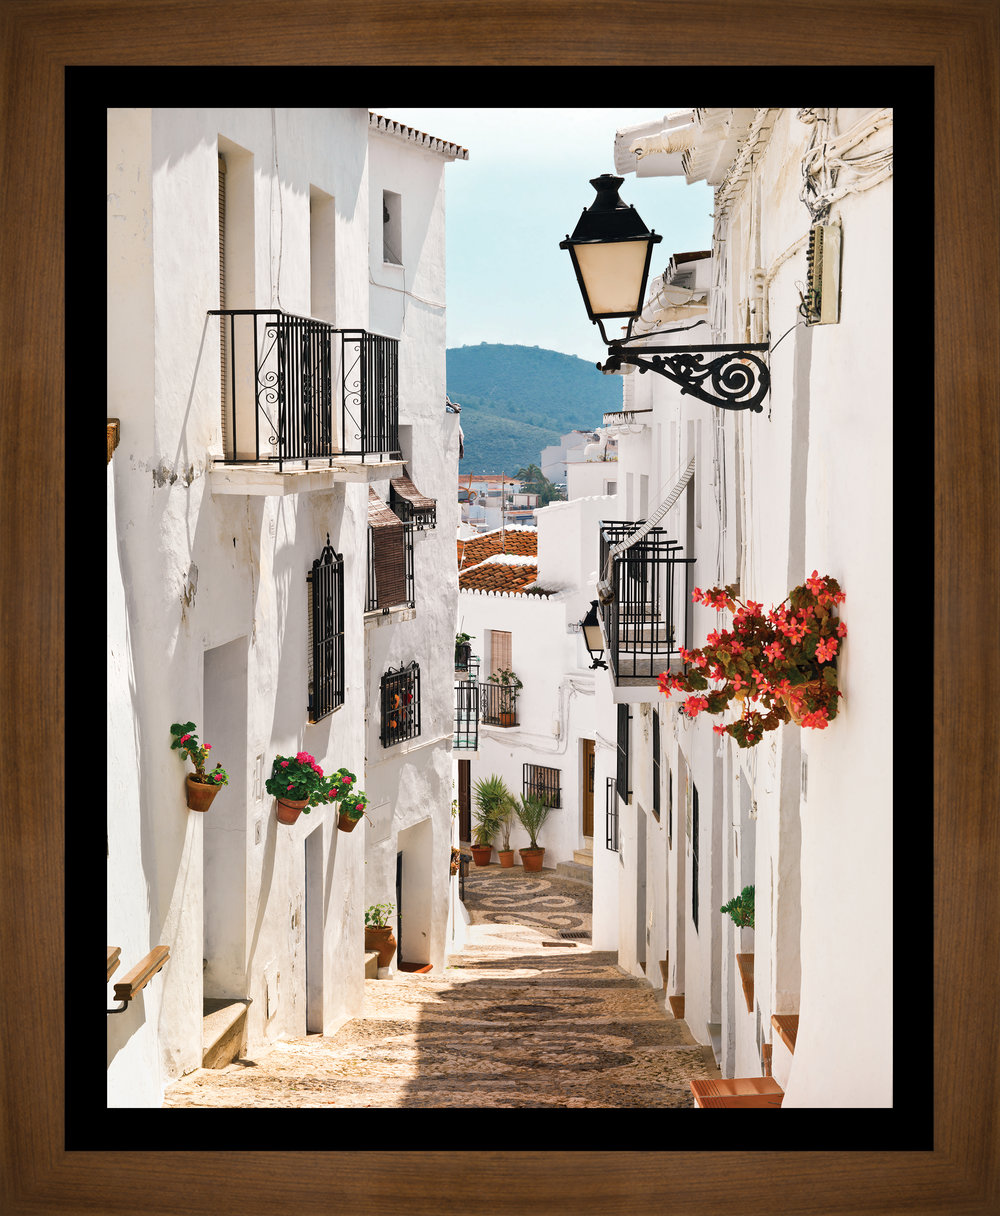 Calle-de-Blanco-I-F.jpg